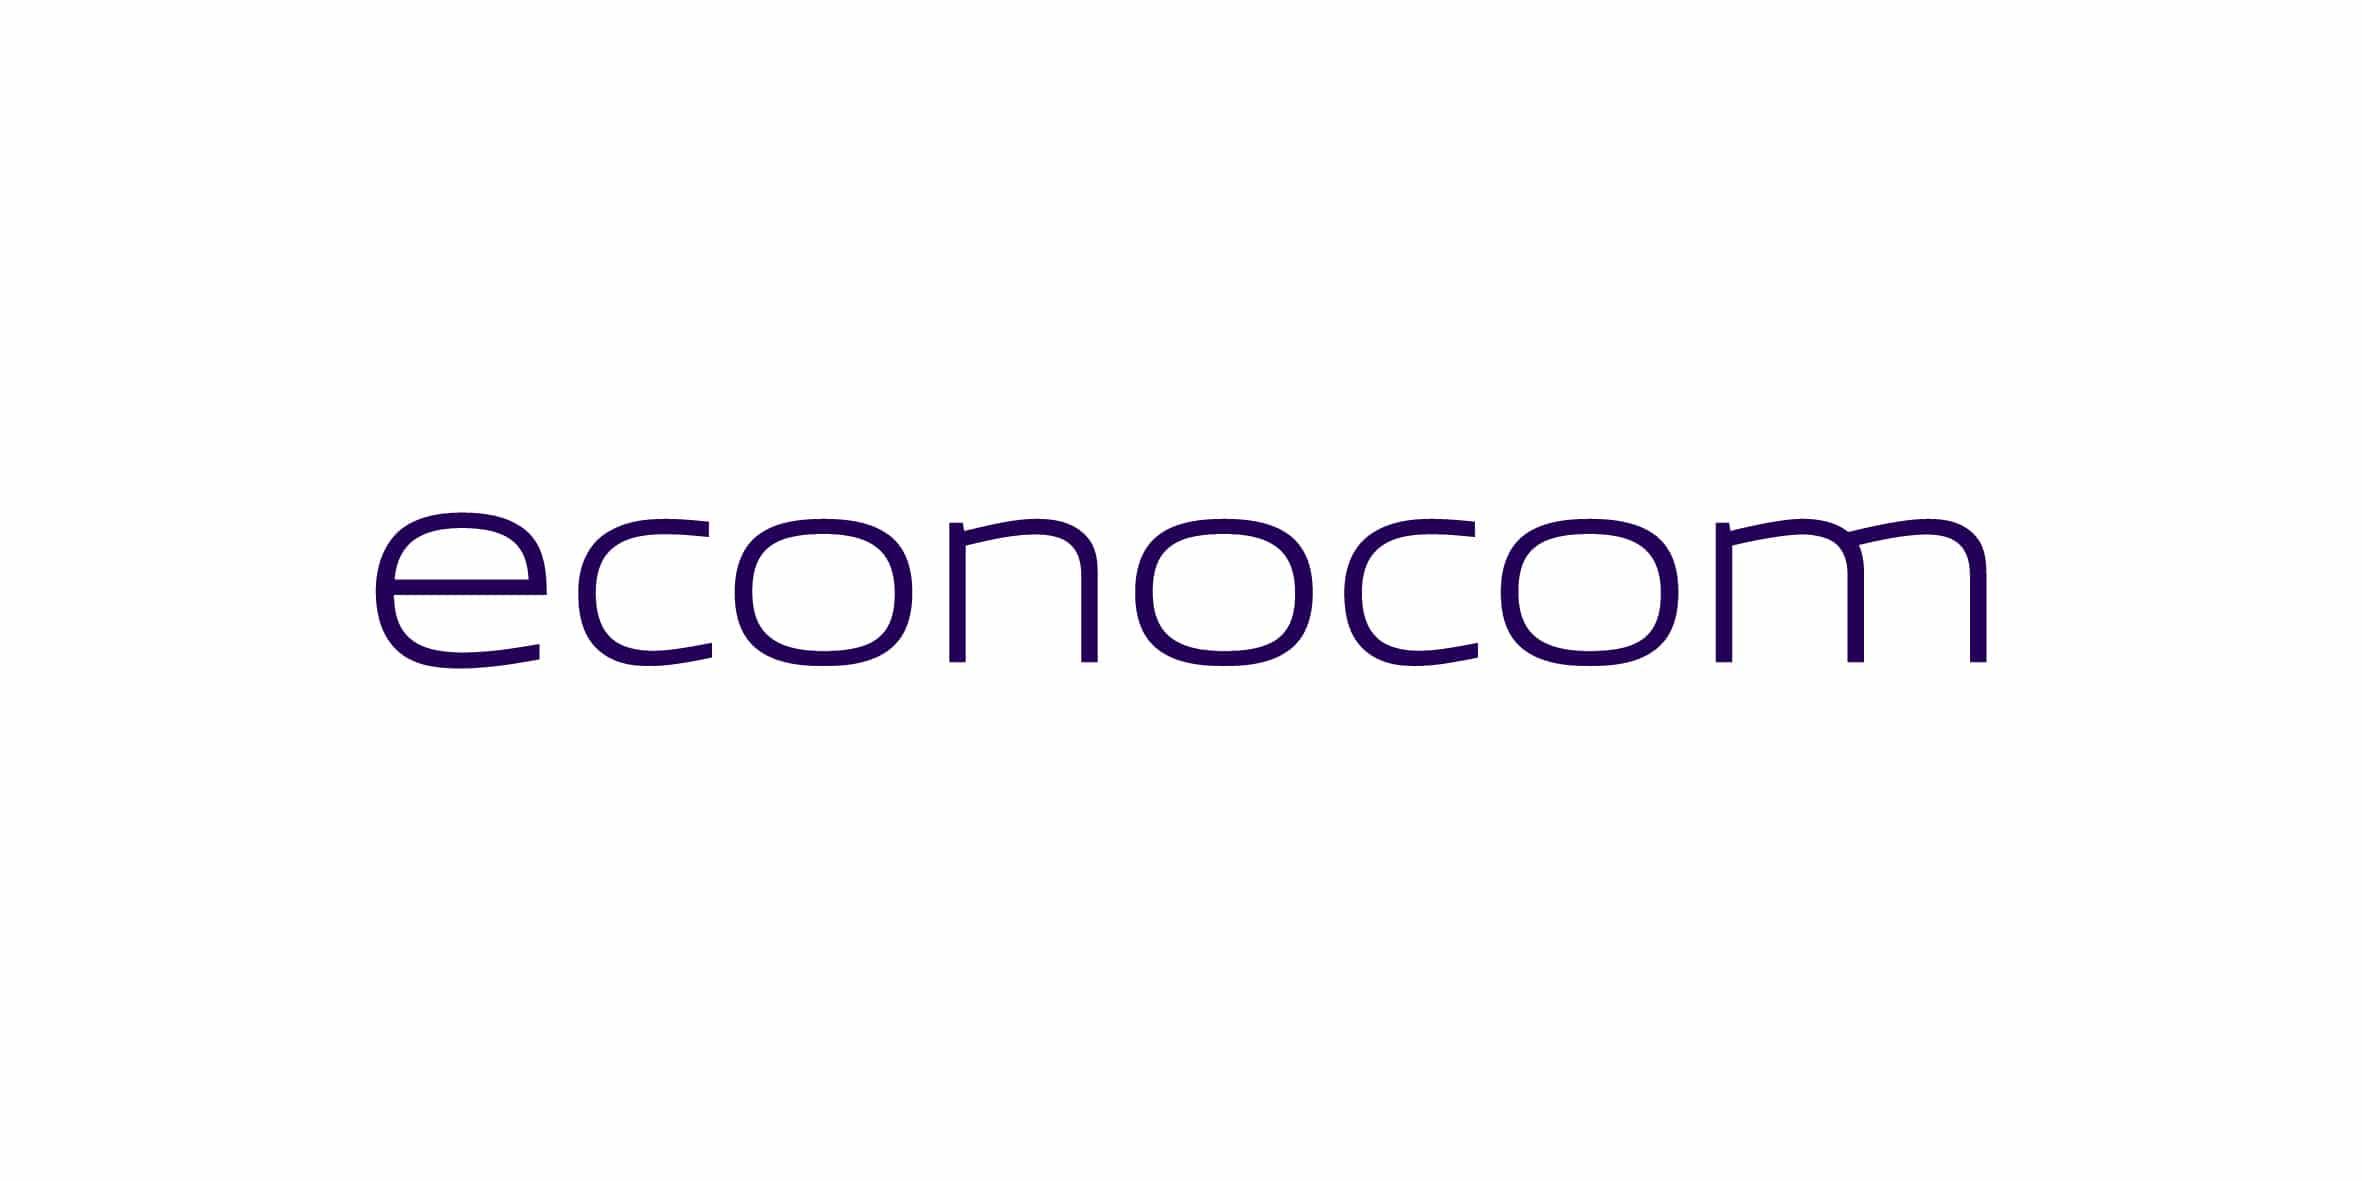 https://www.lacuisineduweb.com/wp-content/uploads/2016/09/logo_econocom_bleu_rvb_hd